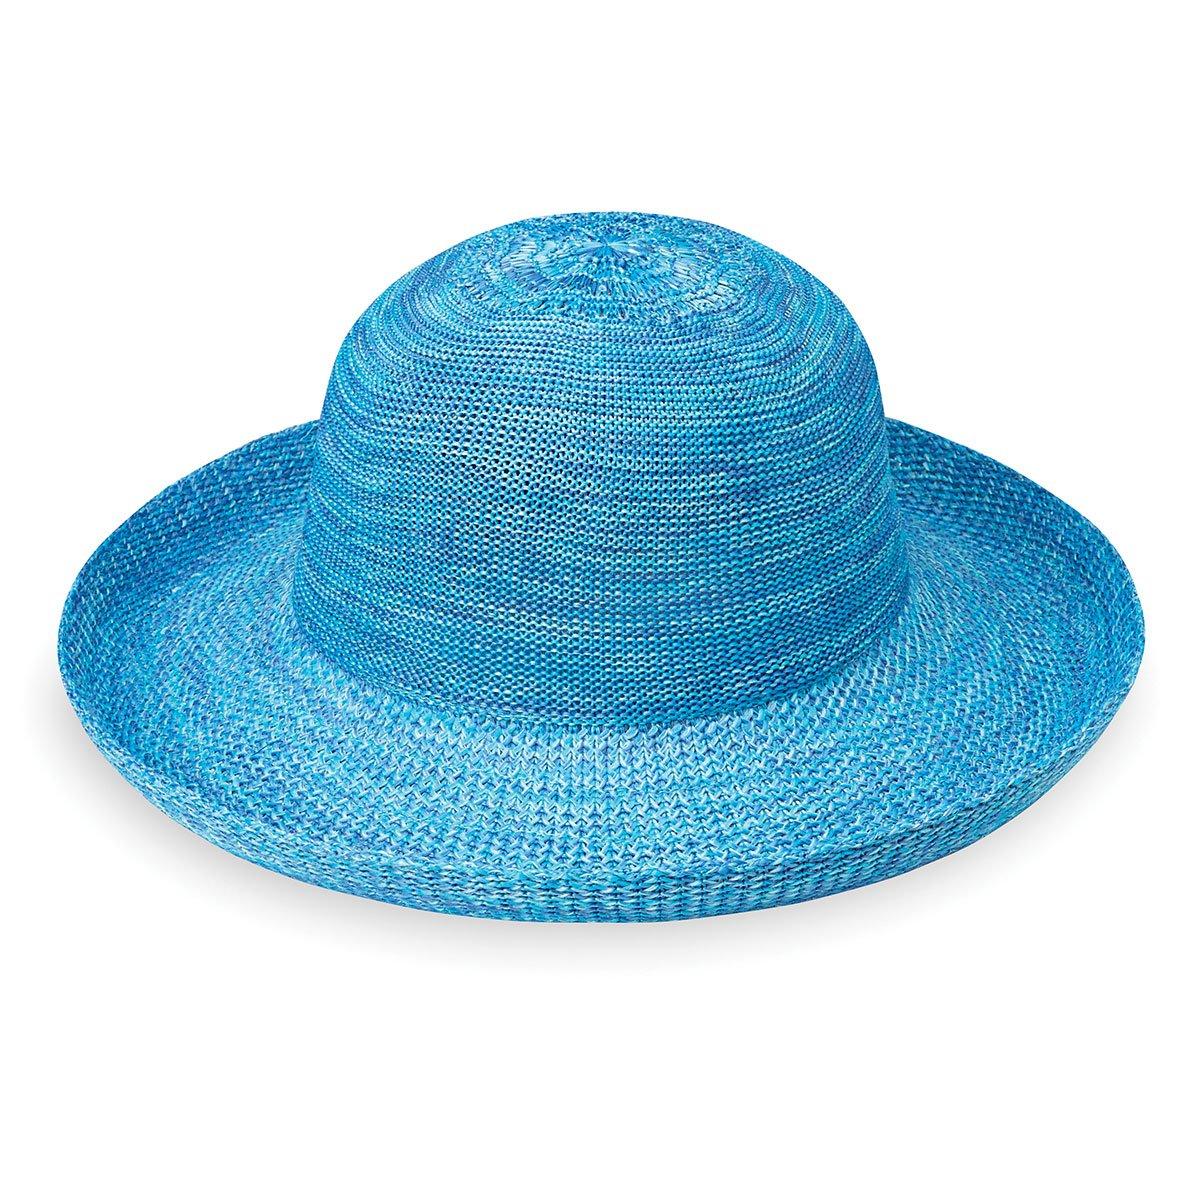 Wallaroo Hat Company Women's Victoria Sun Hat - Lightweight and Packable Hat, Mixed Aqua